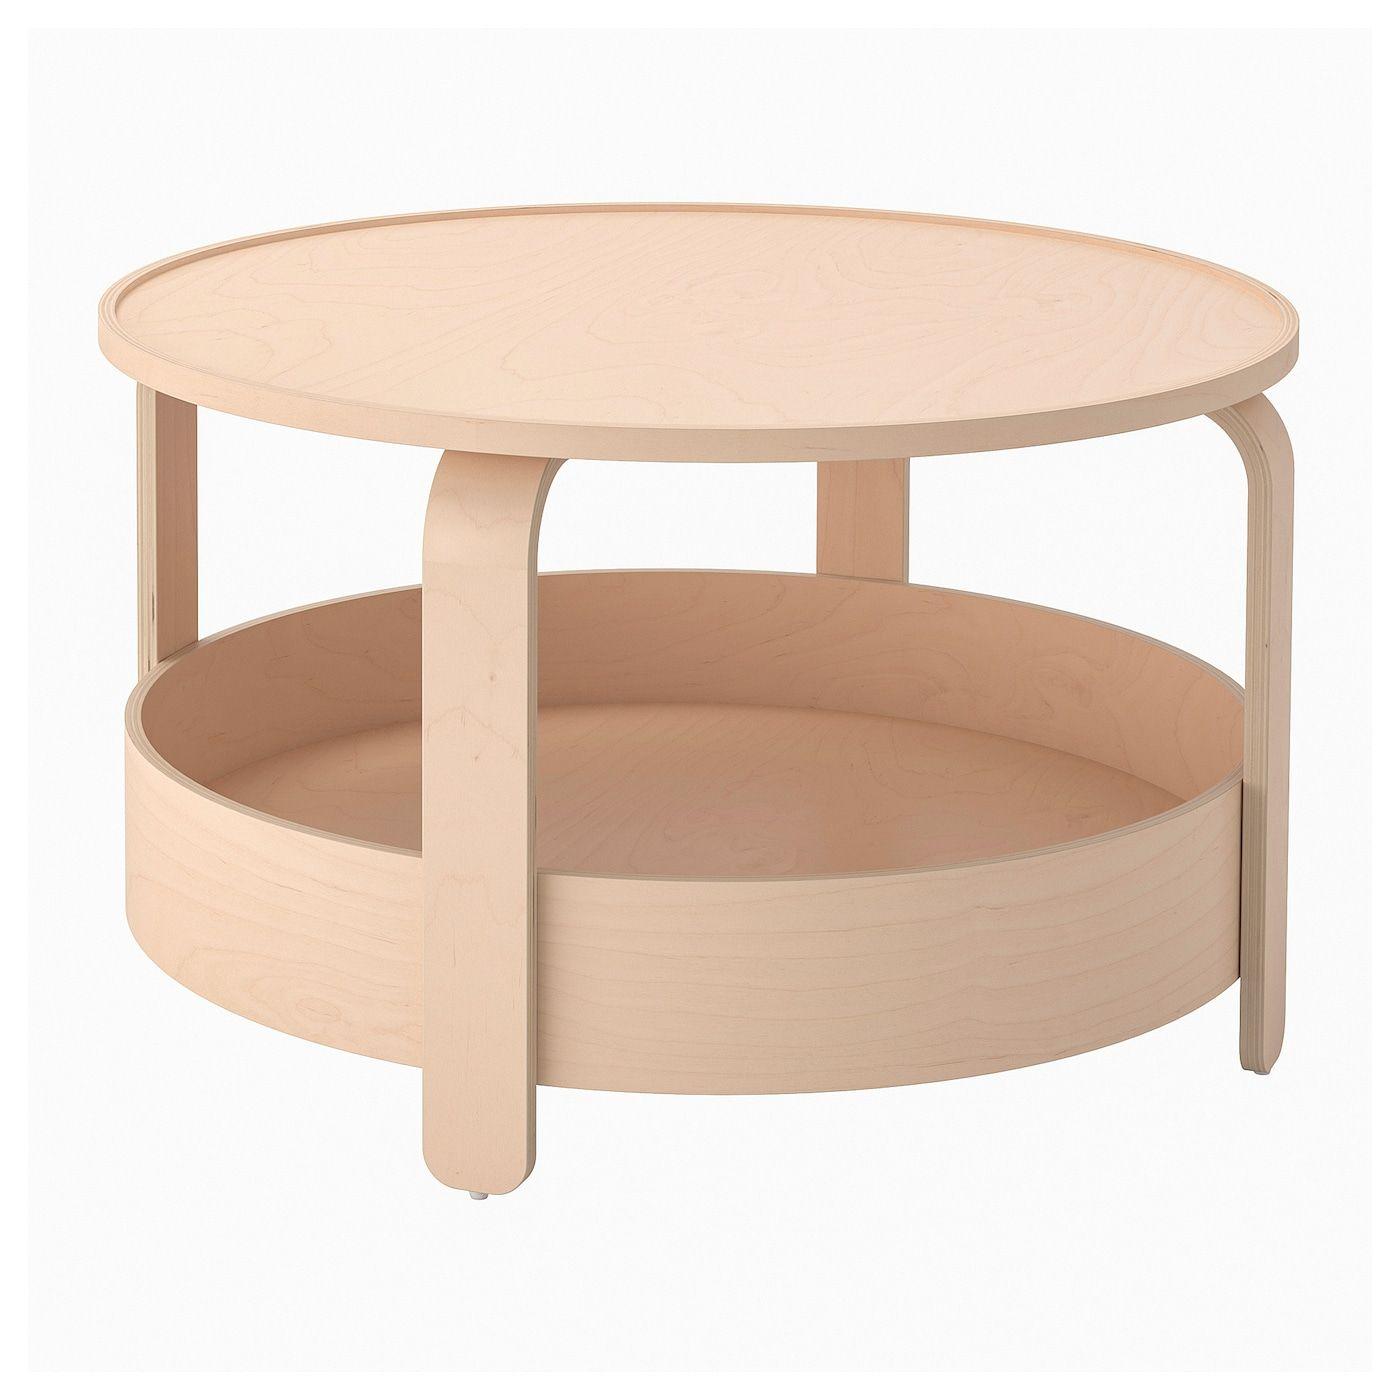 Borgeby Coffee Table Birch Veneer 271 2 Ikea In 2021 Coffee Table Ikea Ikea Finds [ 1400 x 1400 Pixel ]